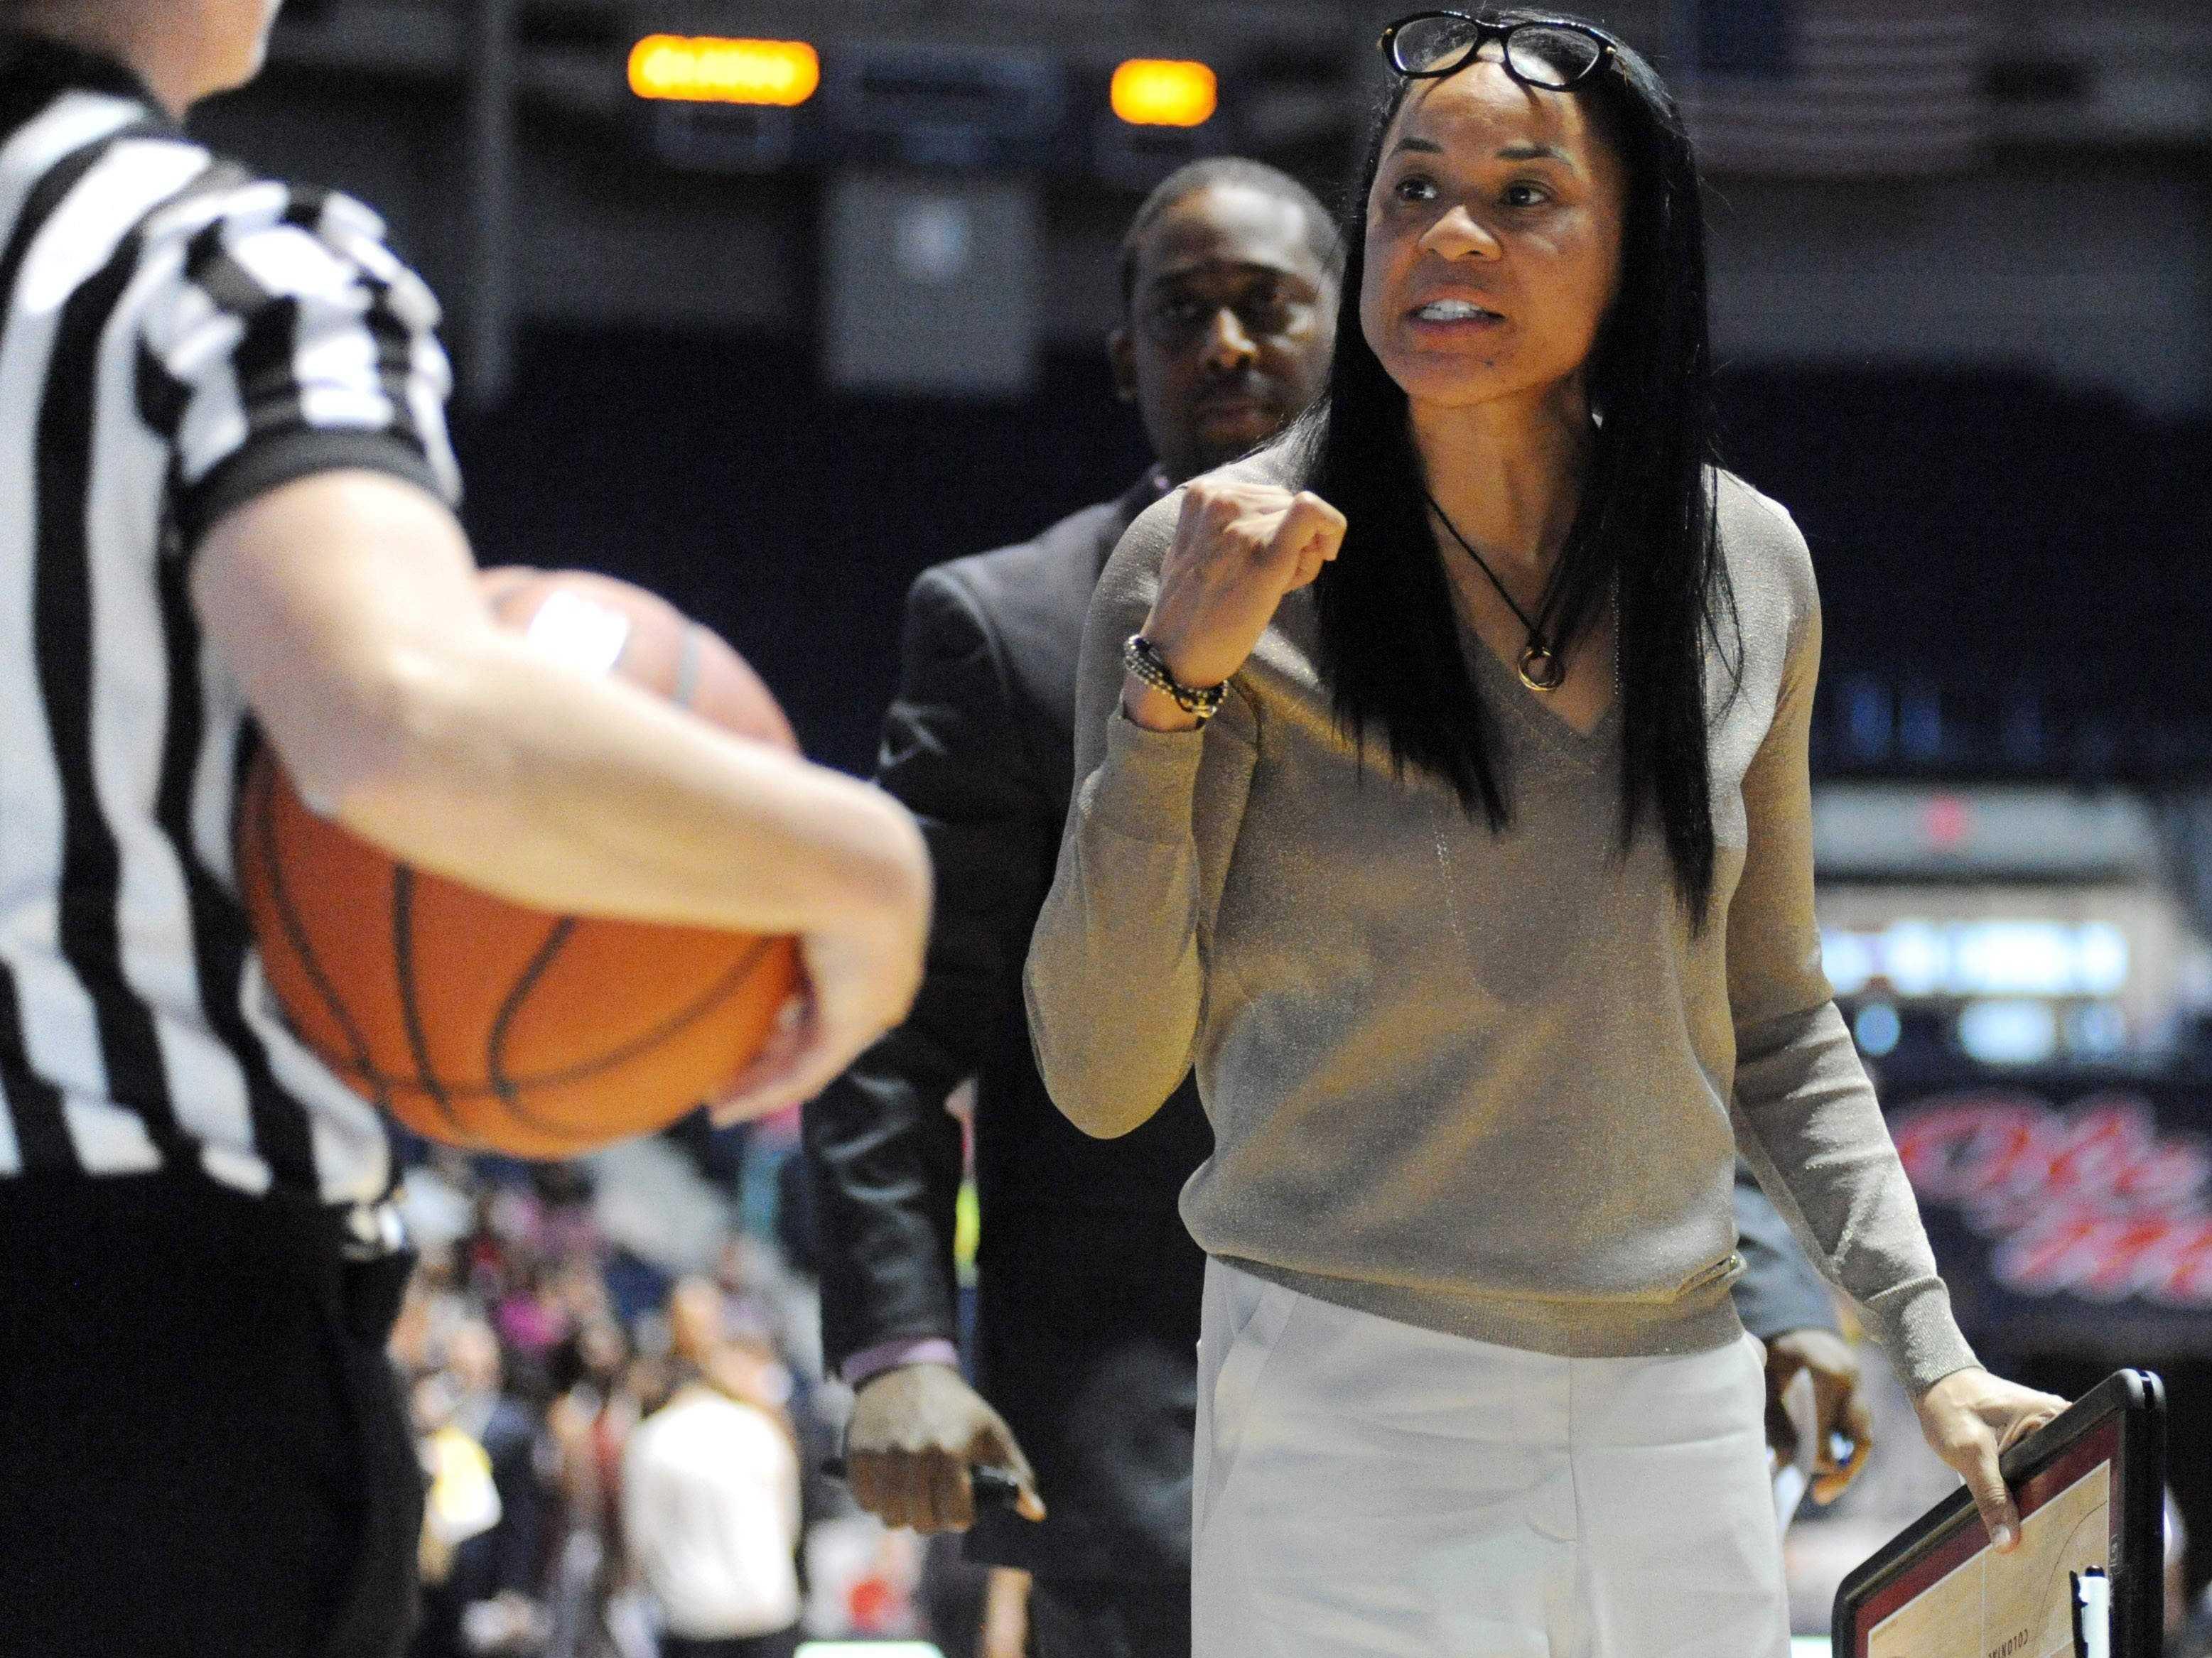 South Carolina Women's Hoops Coach: No White House Invite